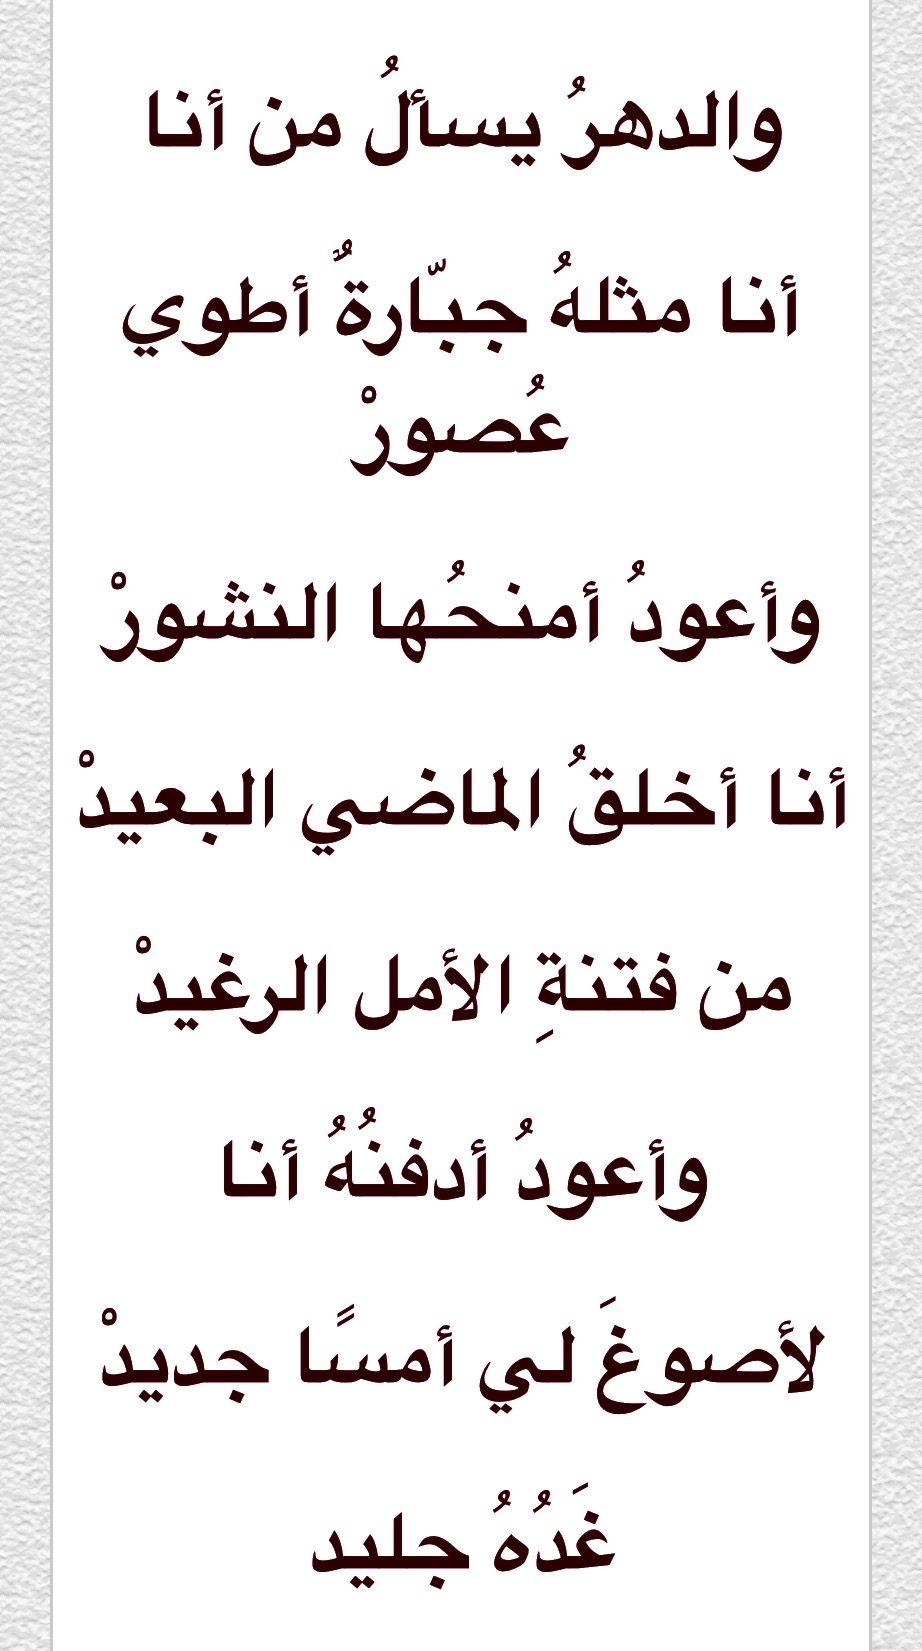 Desertrose الليل يسأل من أنا نازك الملائكة Image Quotes Arabic Quotes Quotes